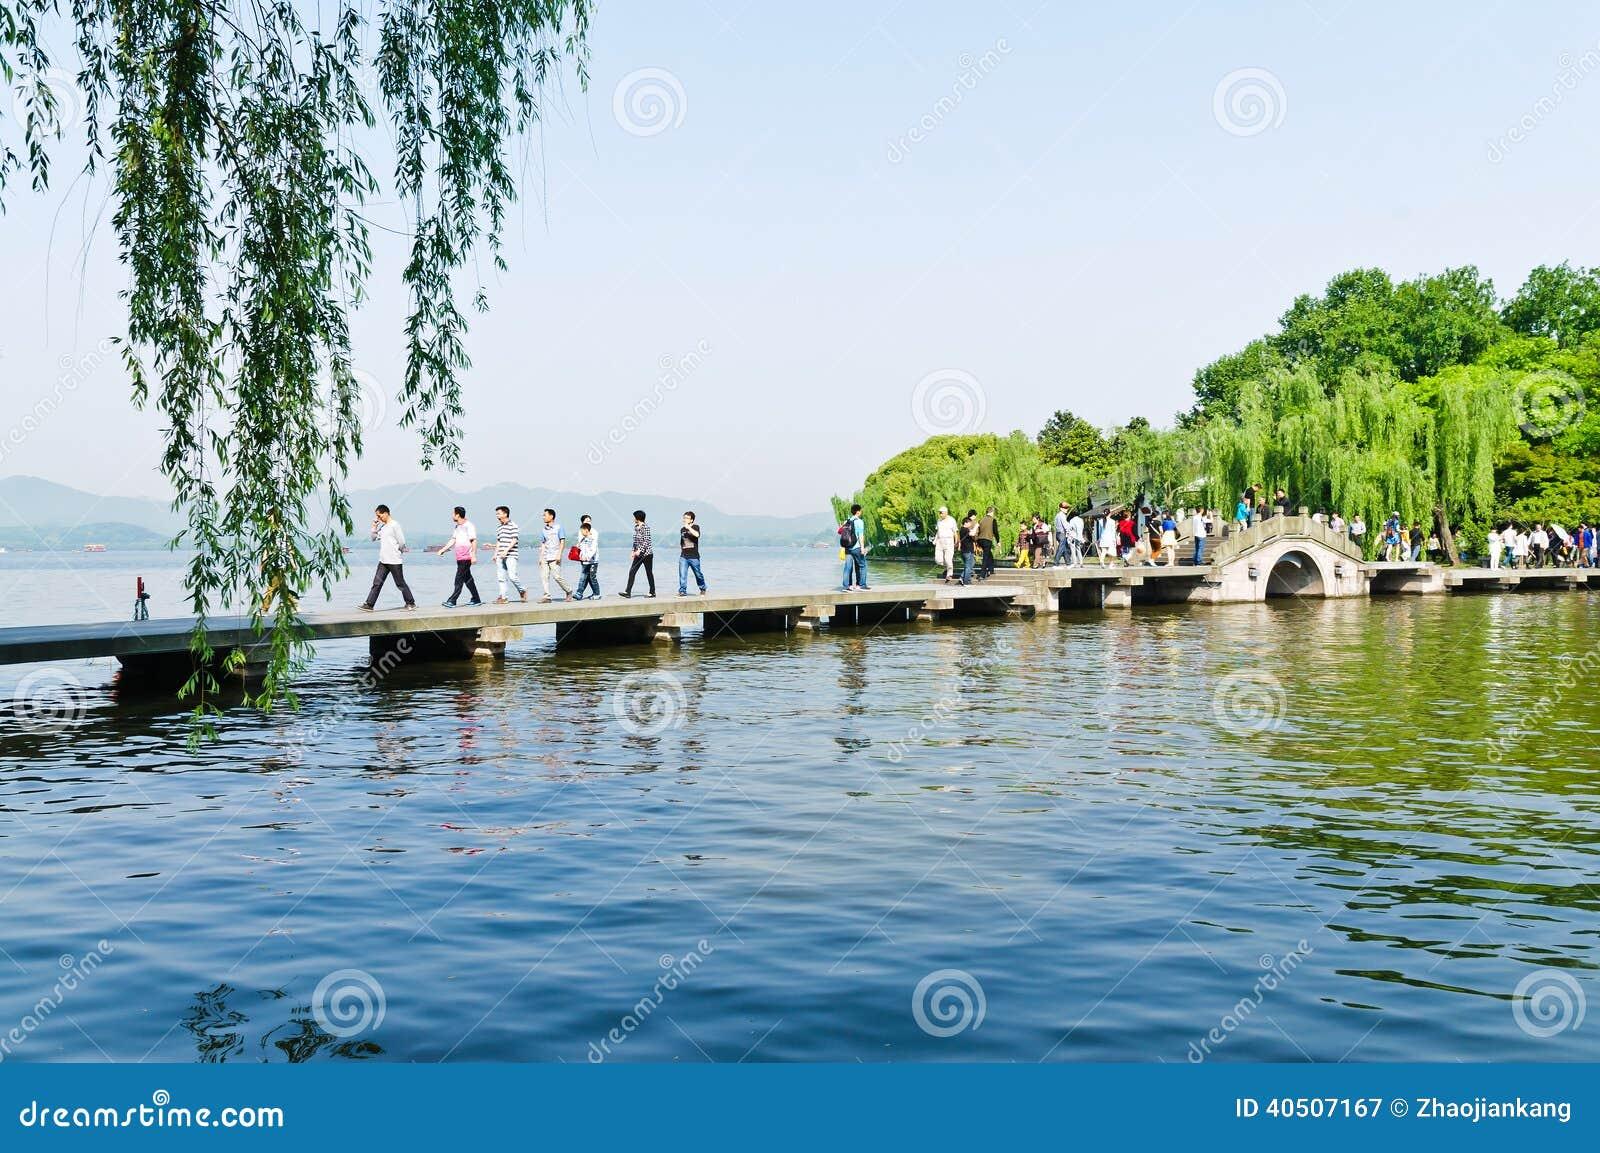 Zachodni jeziorna Hangzhou sceneria